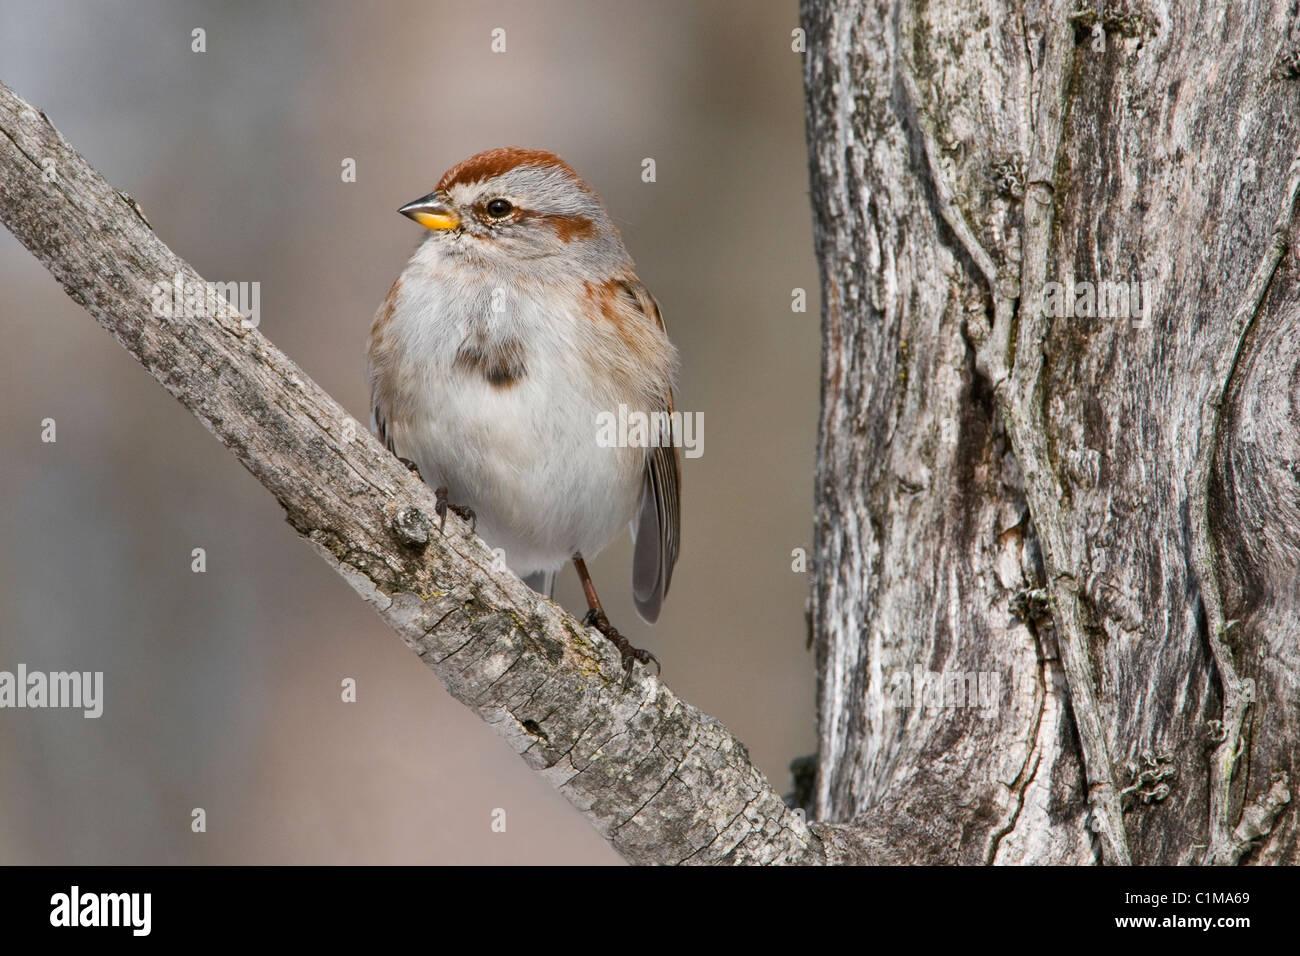 American Tree Sparrow Spizella arborea Male Eastern North America - Stock Image